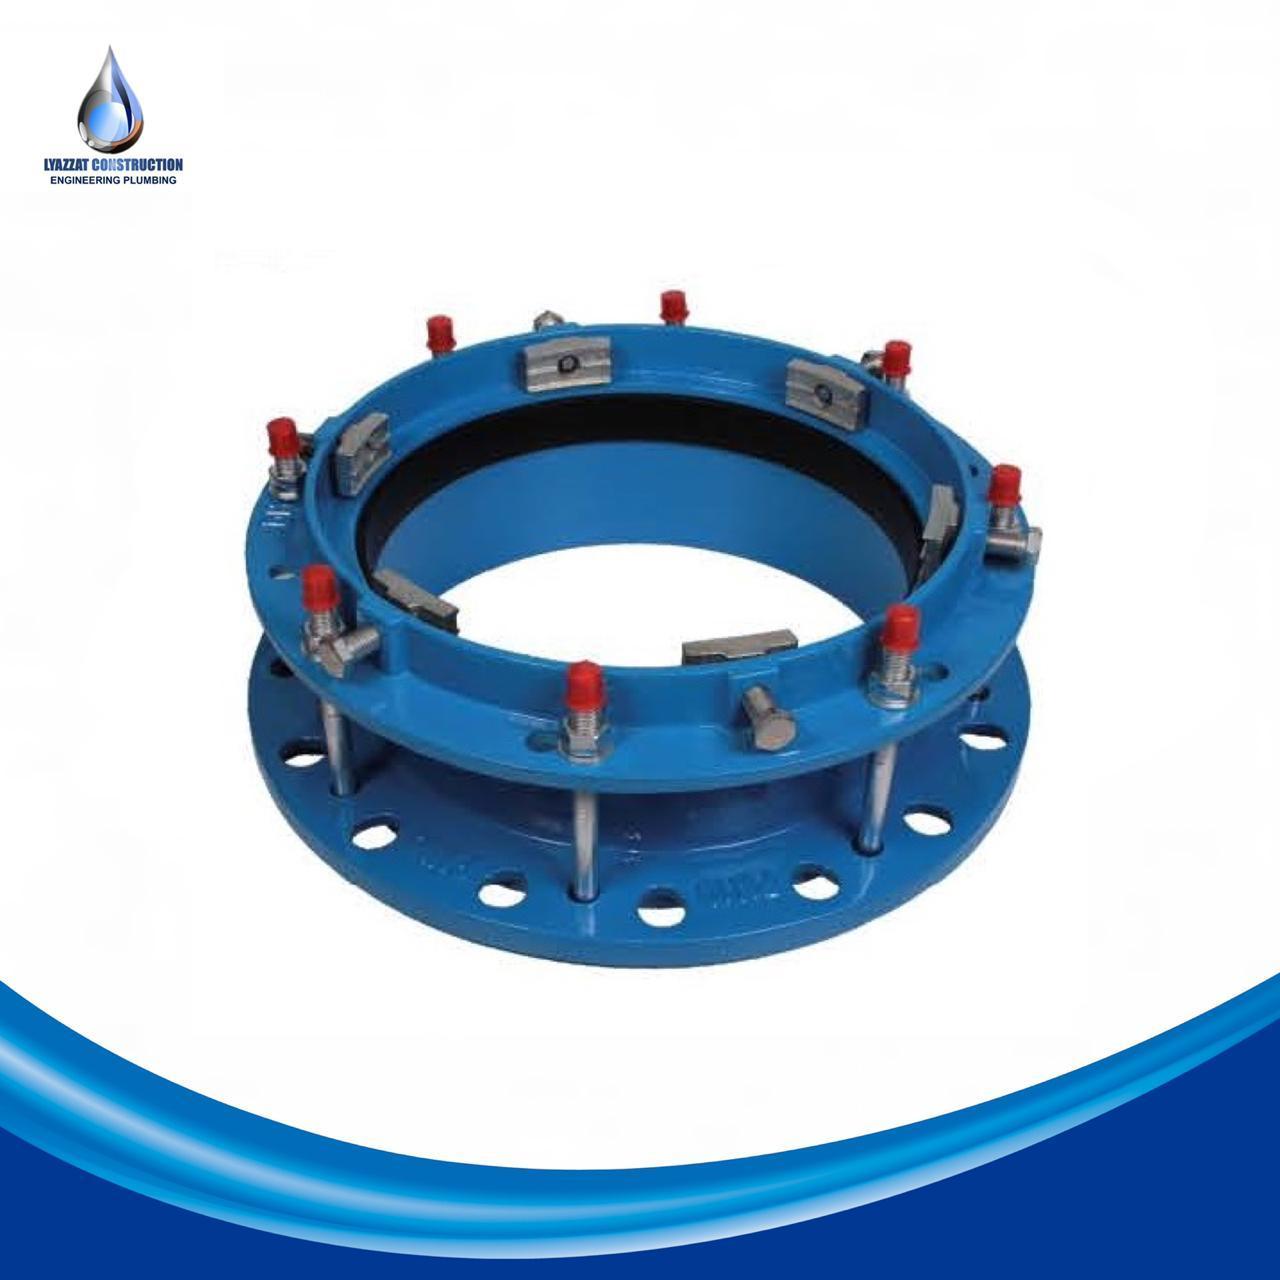 Фланец фиксирующий для ПЭ и ПВХ труб DN 250/280 PN10-16